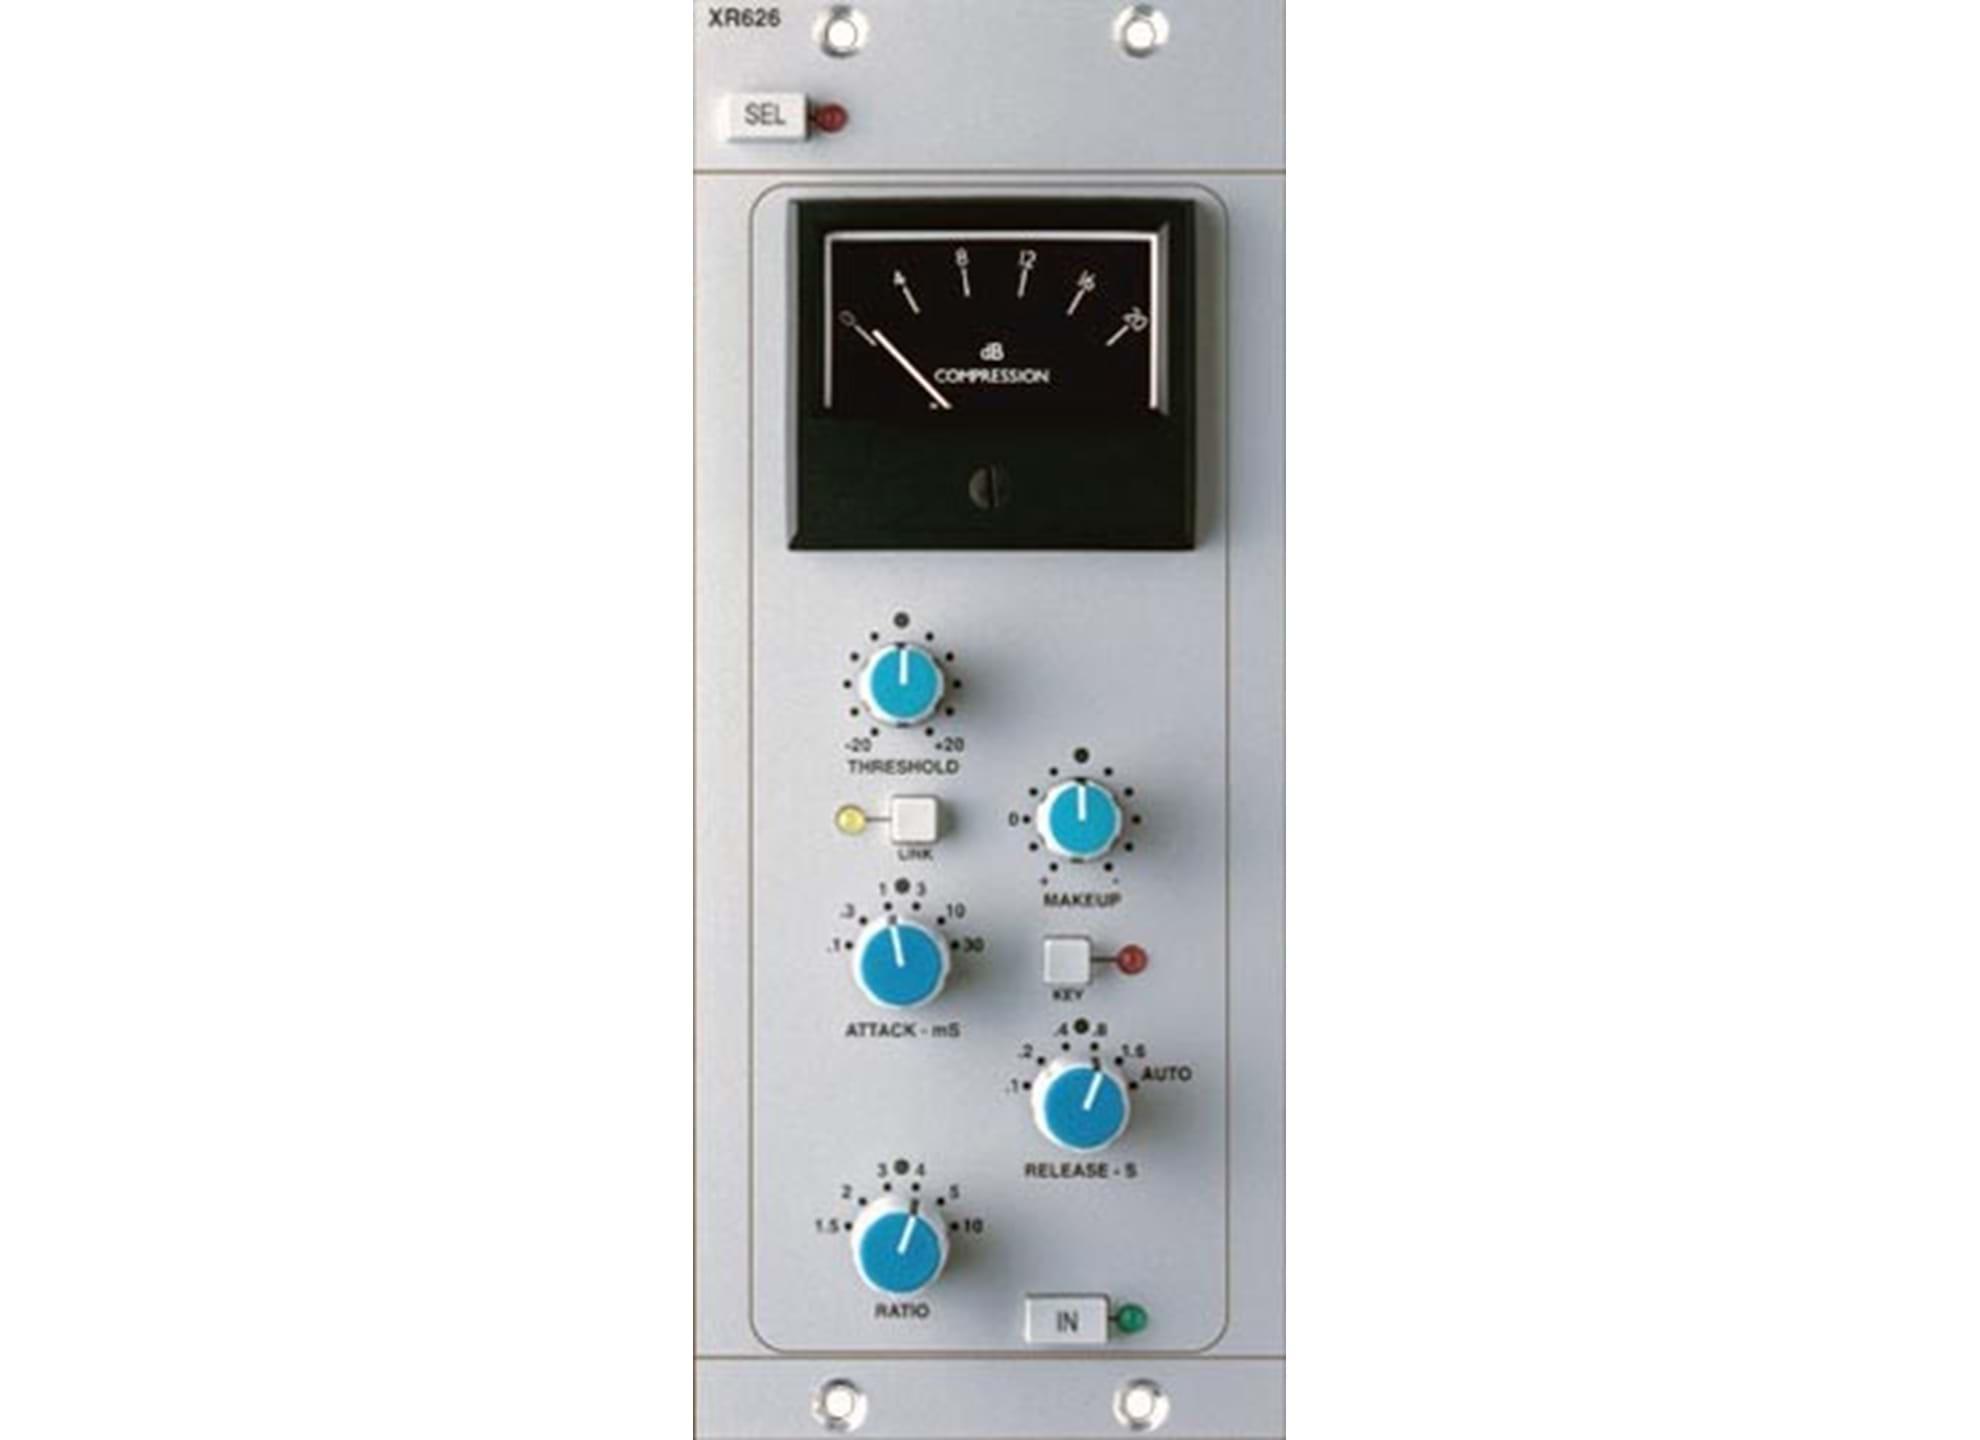 X-Rack Stereo G Compressor Modul